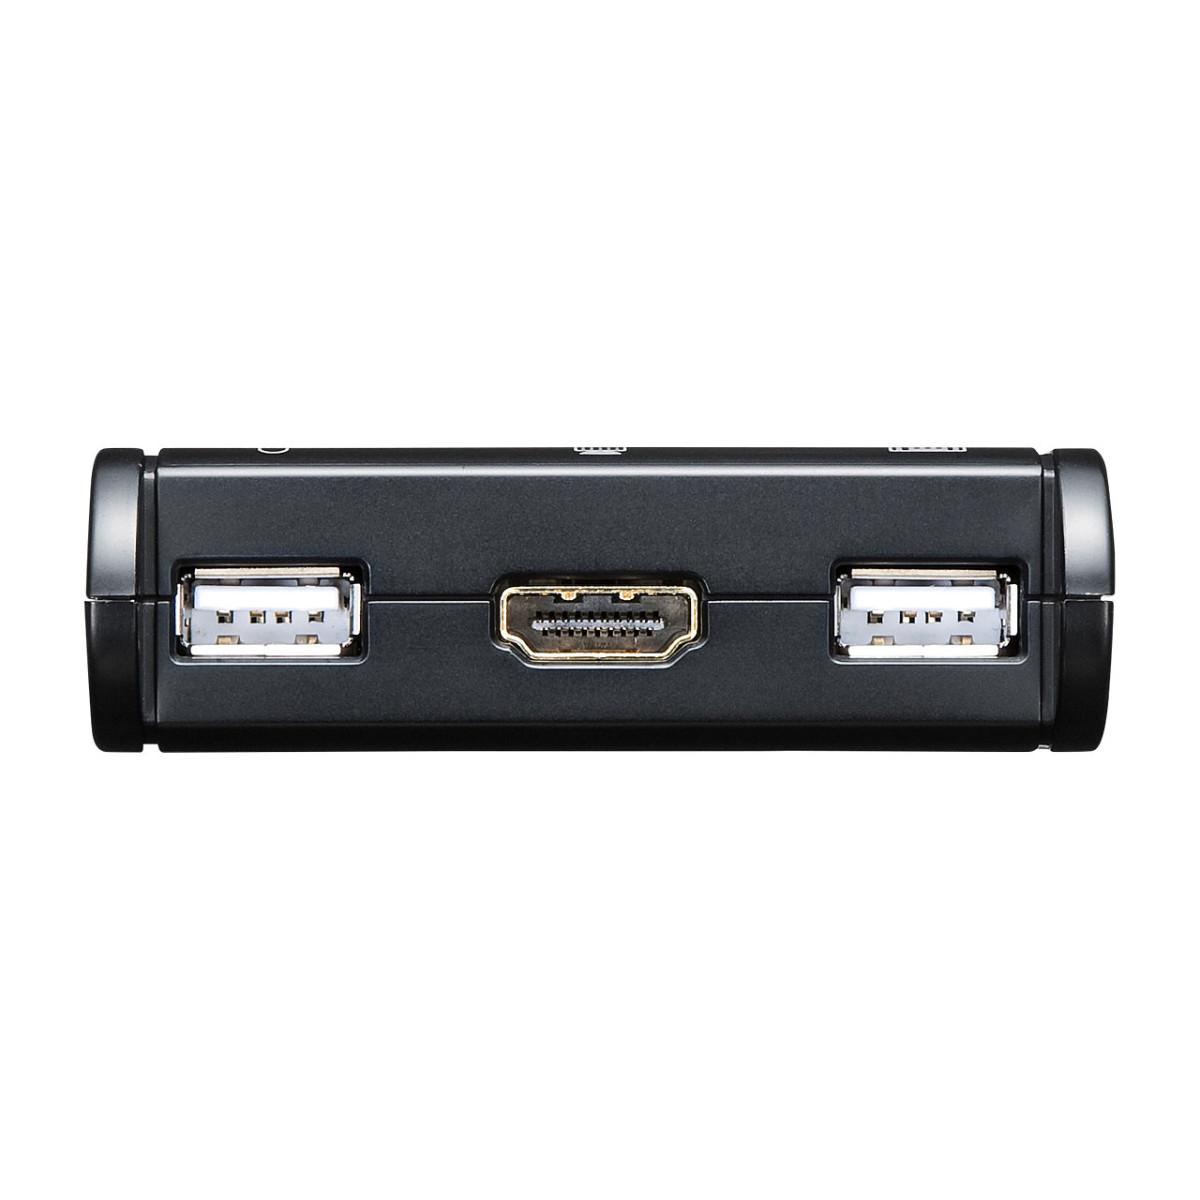 [SW-KVM2WHU] HDMI対応手元スイッチ付きパソコン自動切替器(2:1)